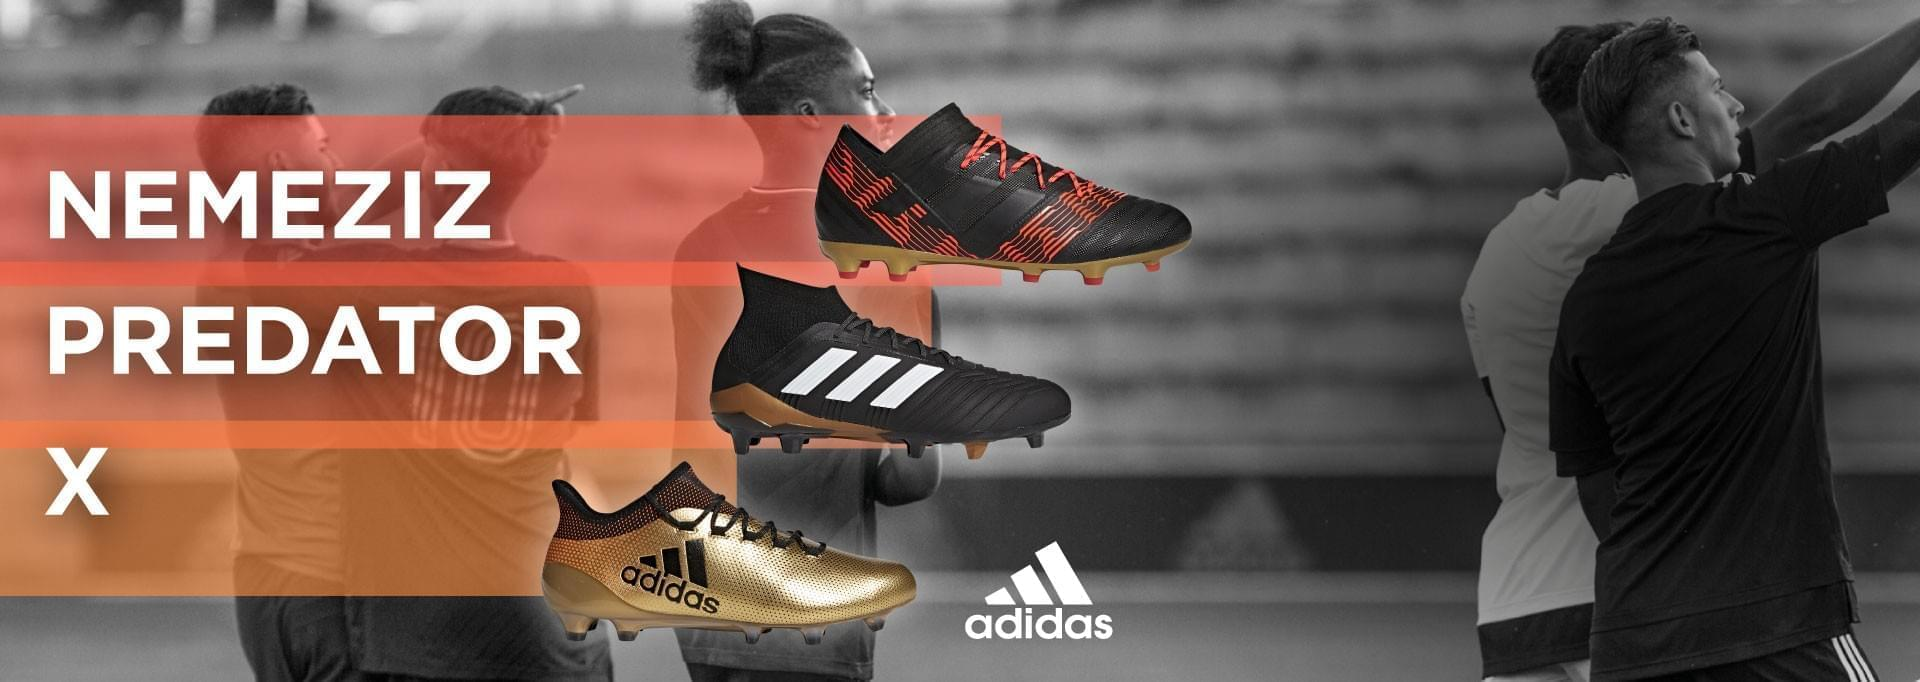 Offerte Adidas calzature calcio